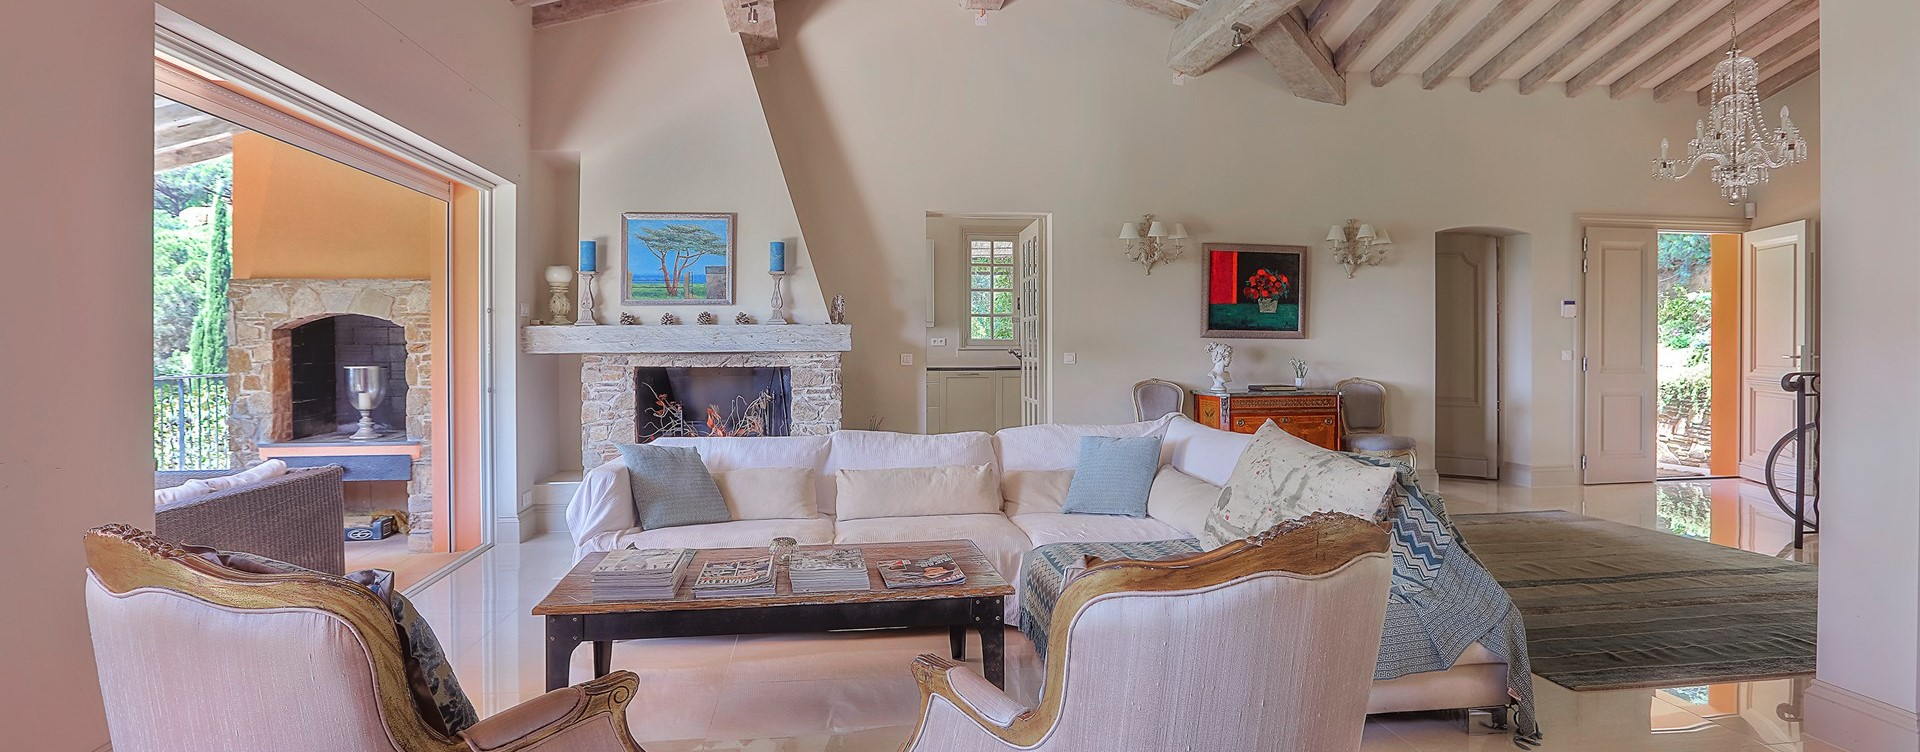 villa-gigaro-open-plan-interior